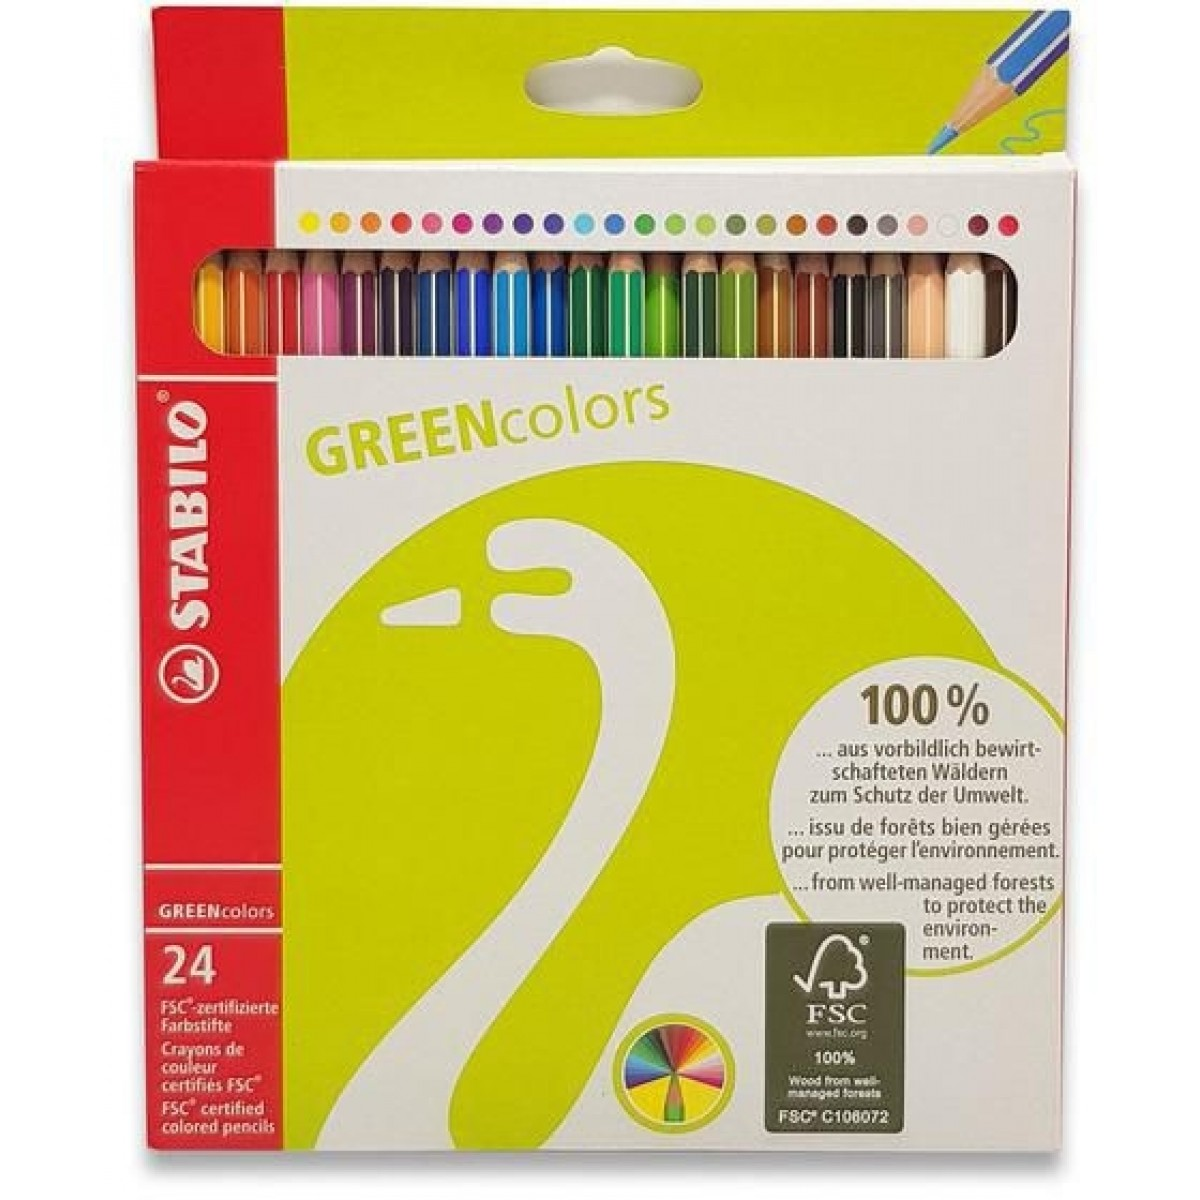 STABILO, Green colors farveblyanter, 24 stk